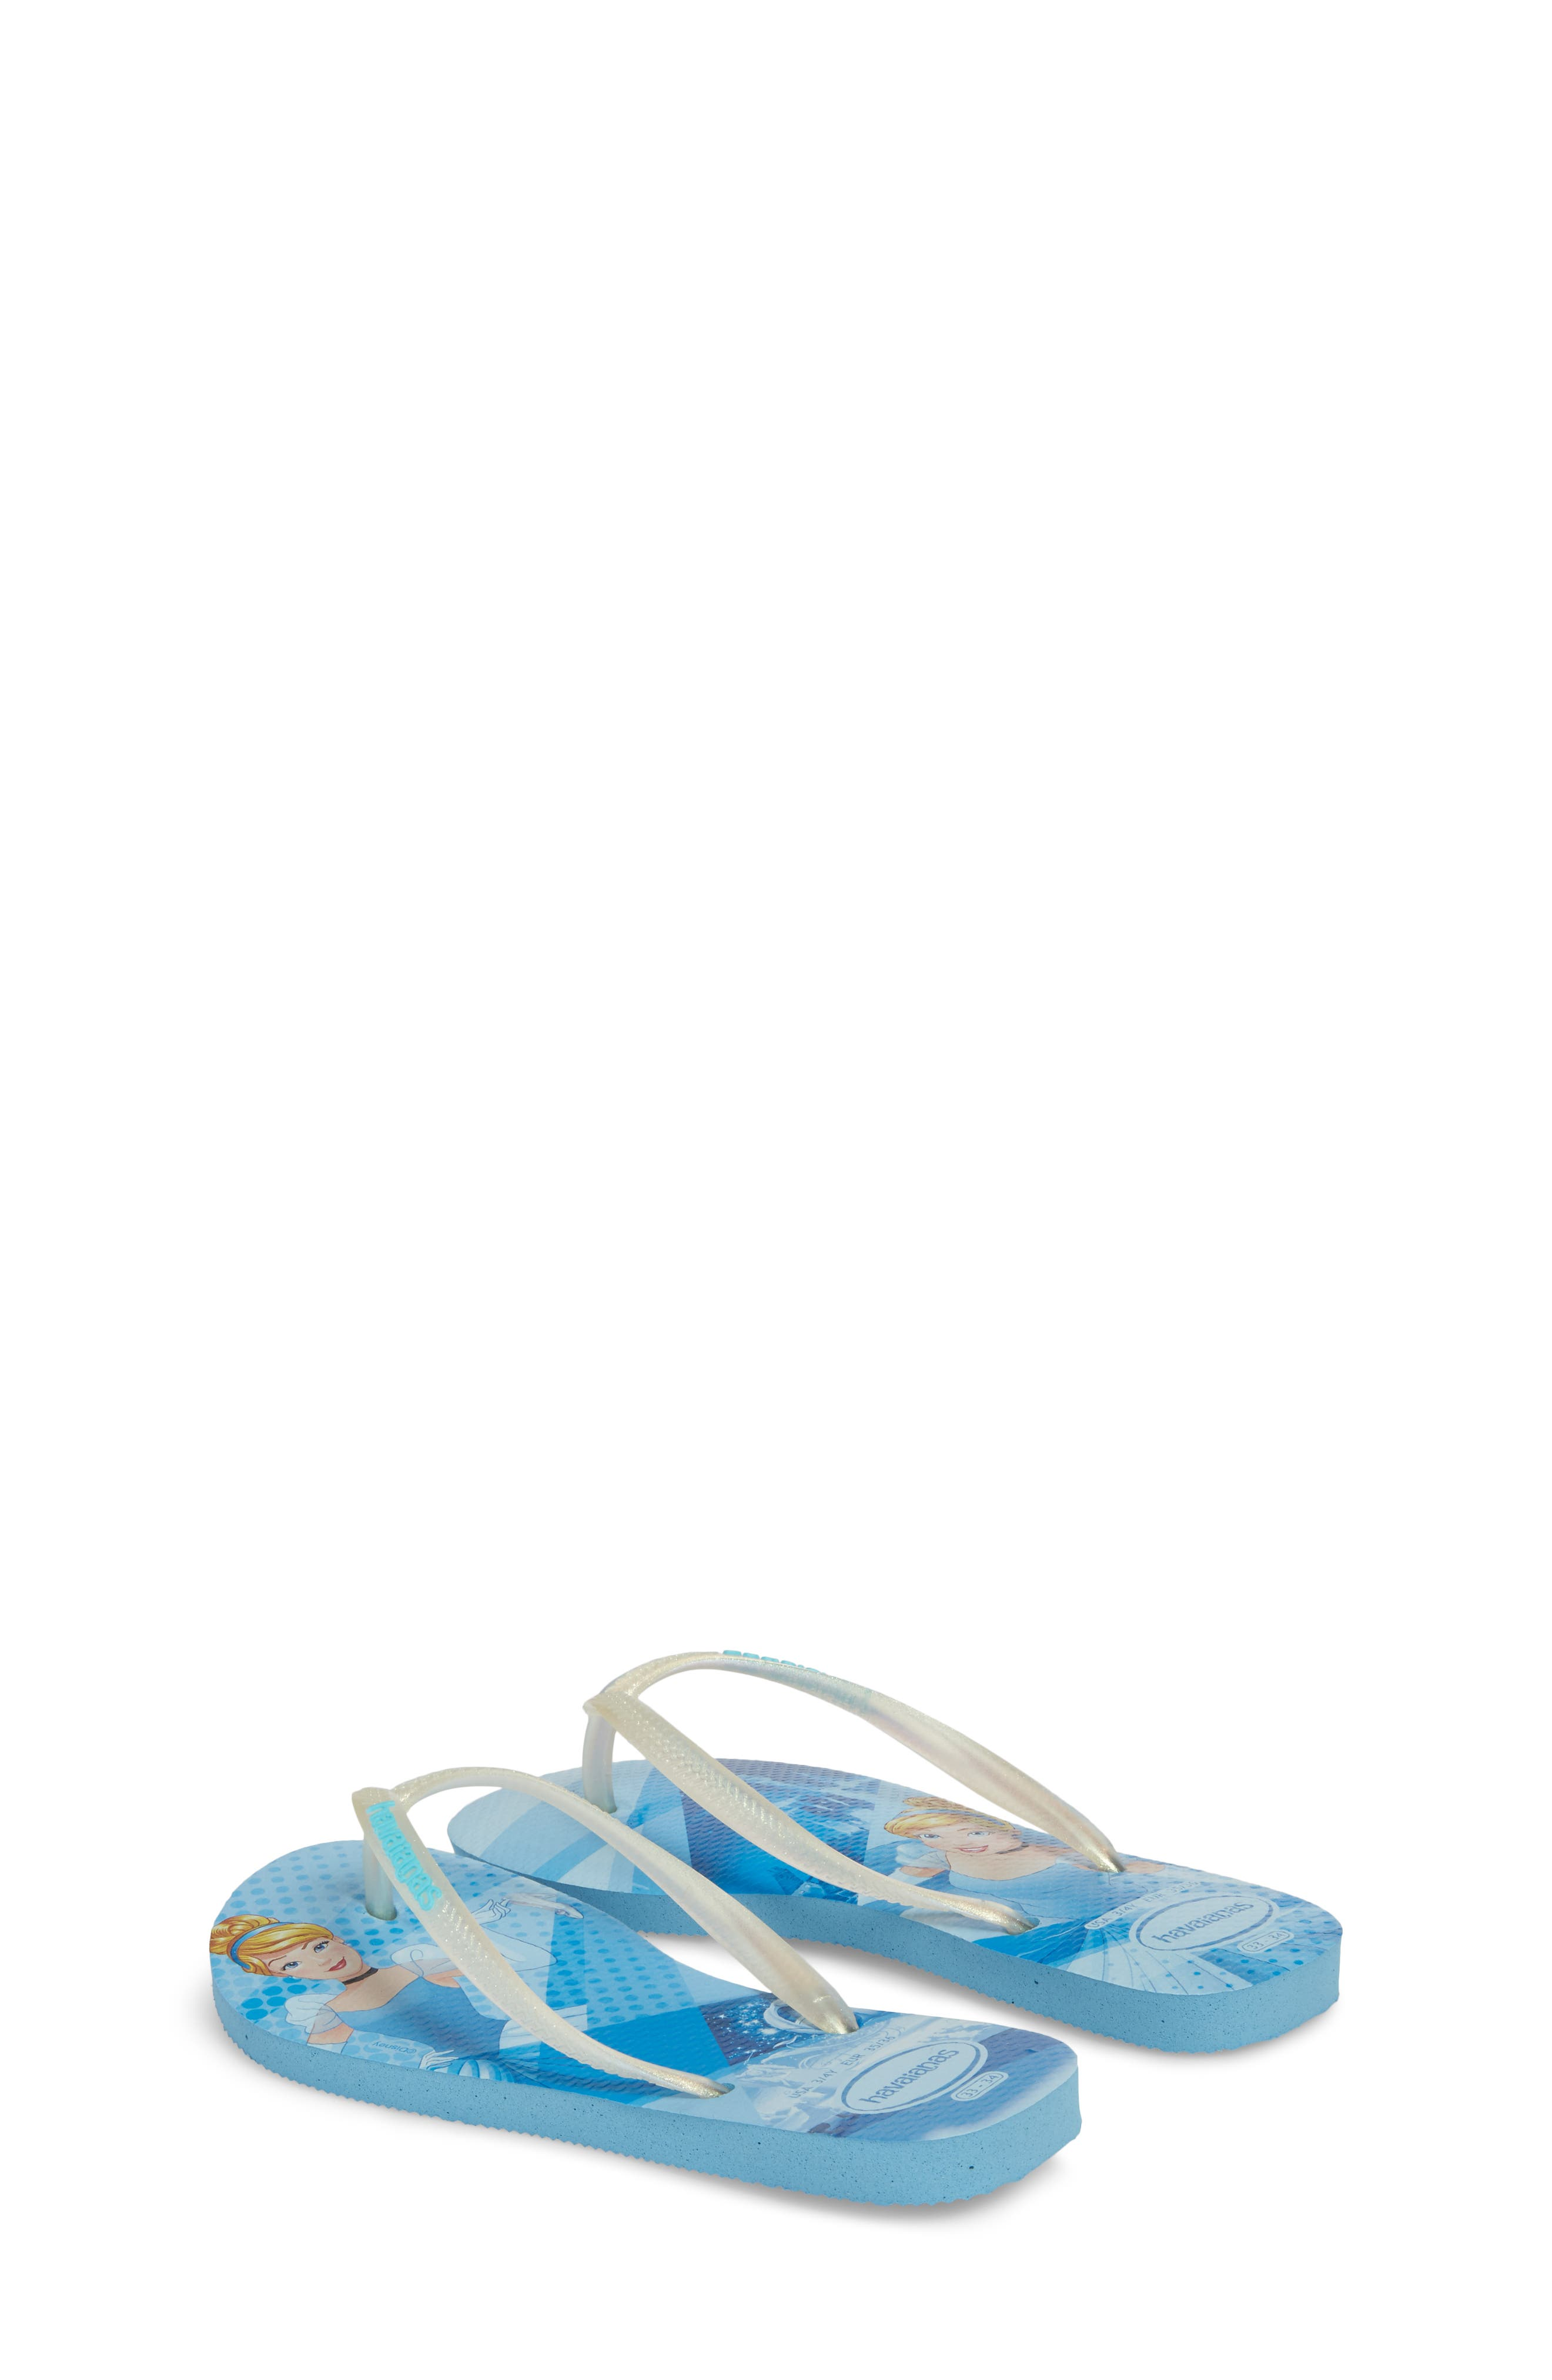 'Disney Princess' Flip Flops,                             Alternate thumbnail 2, color,                             Blue Splash